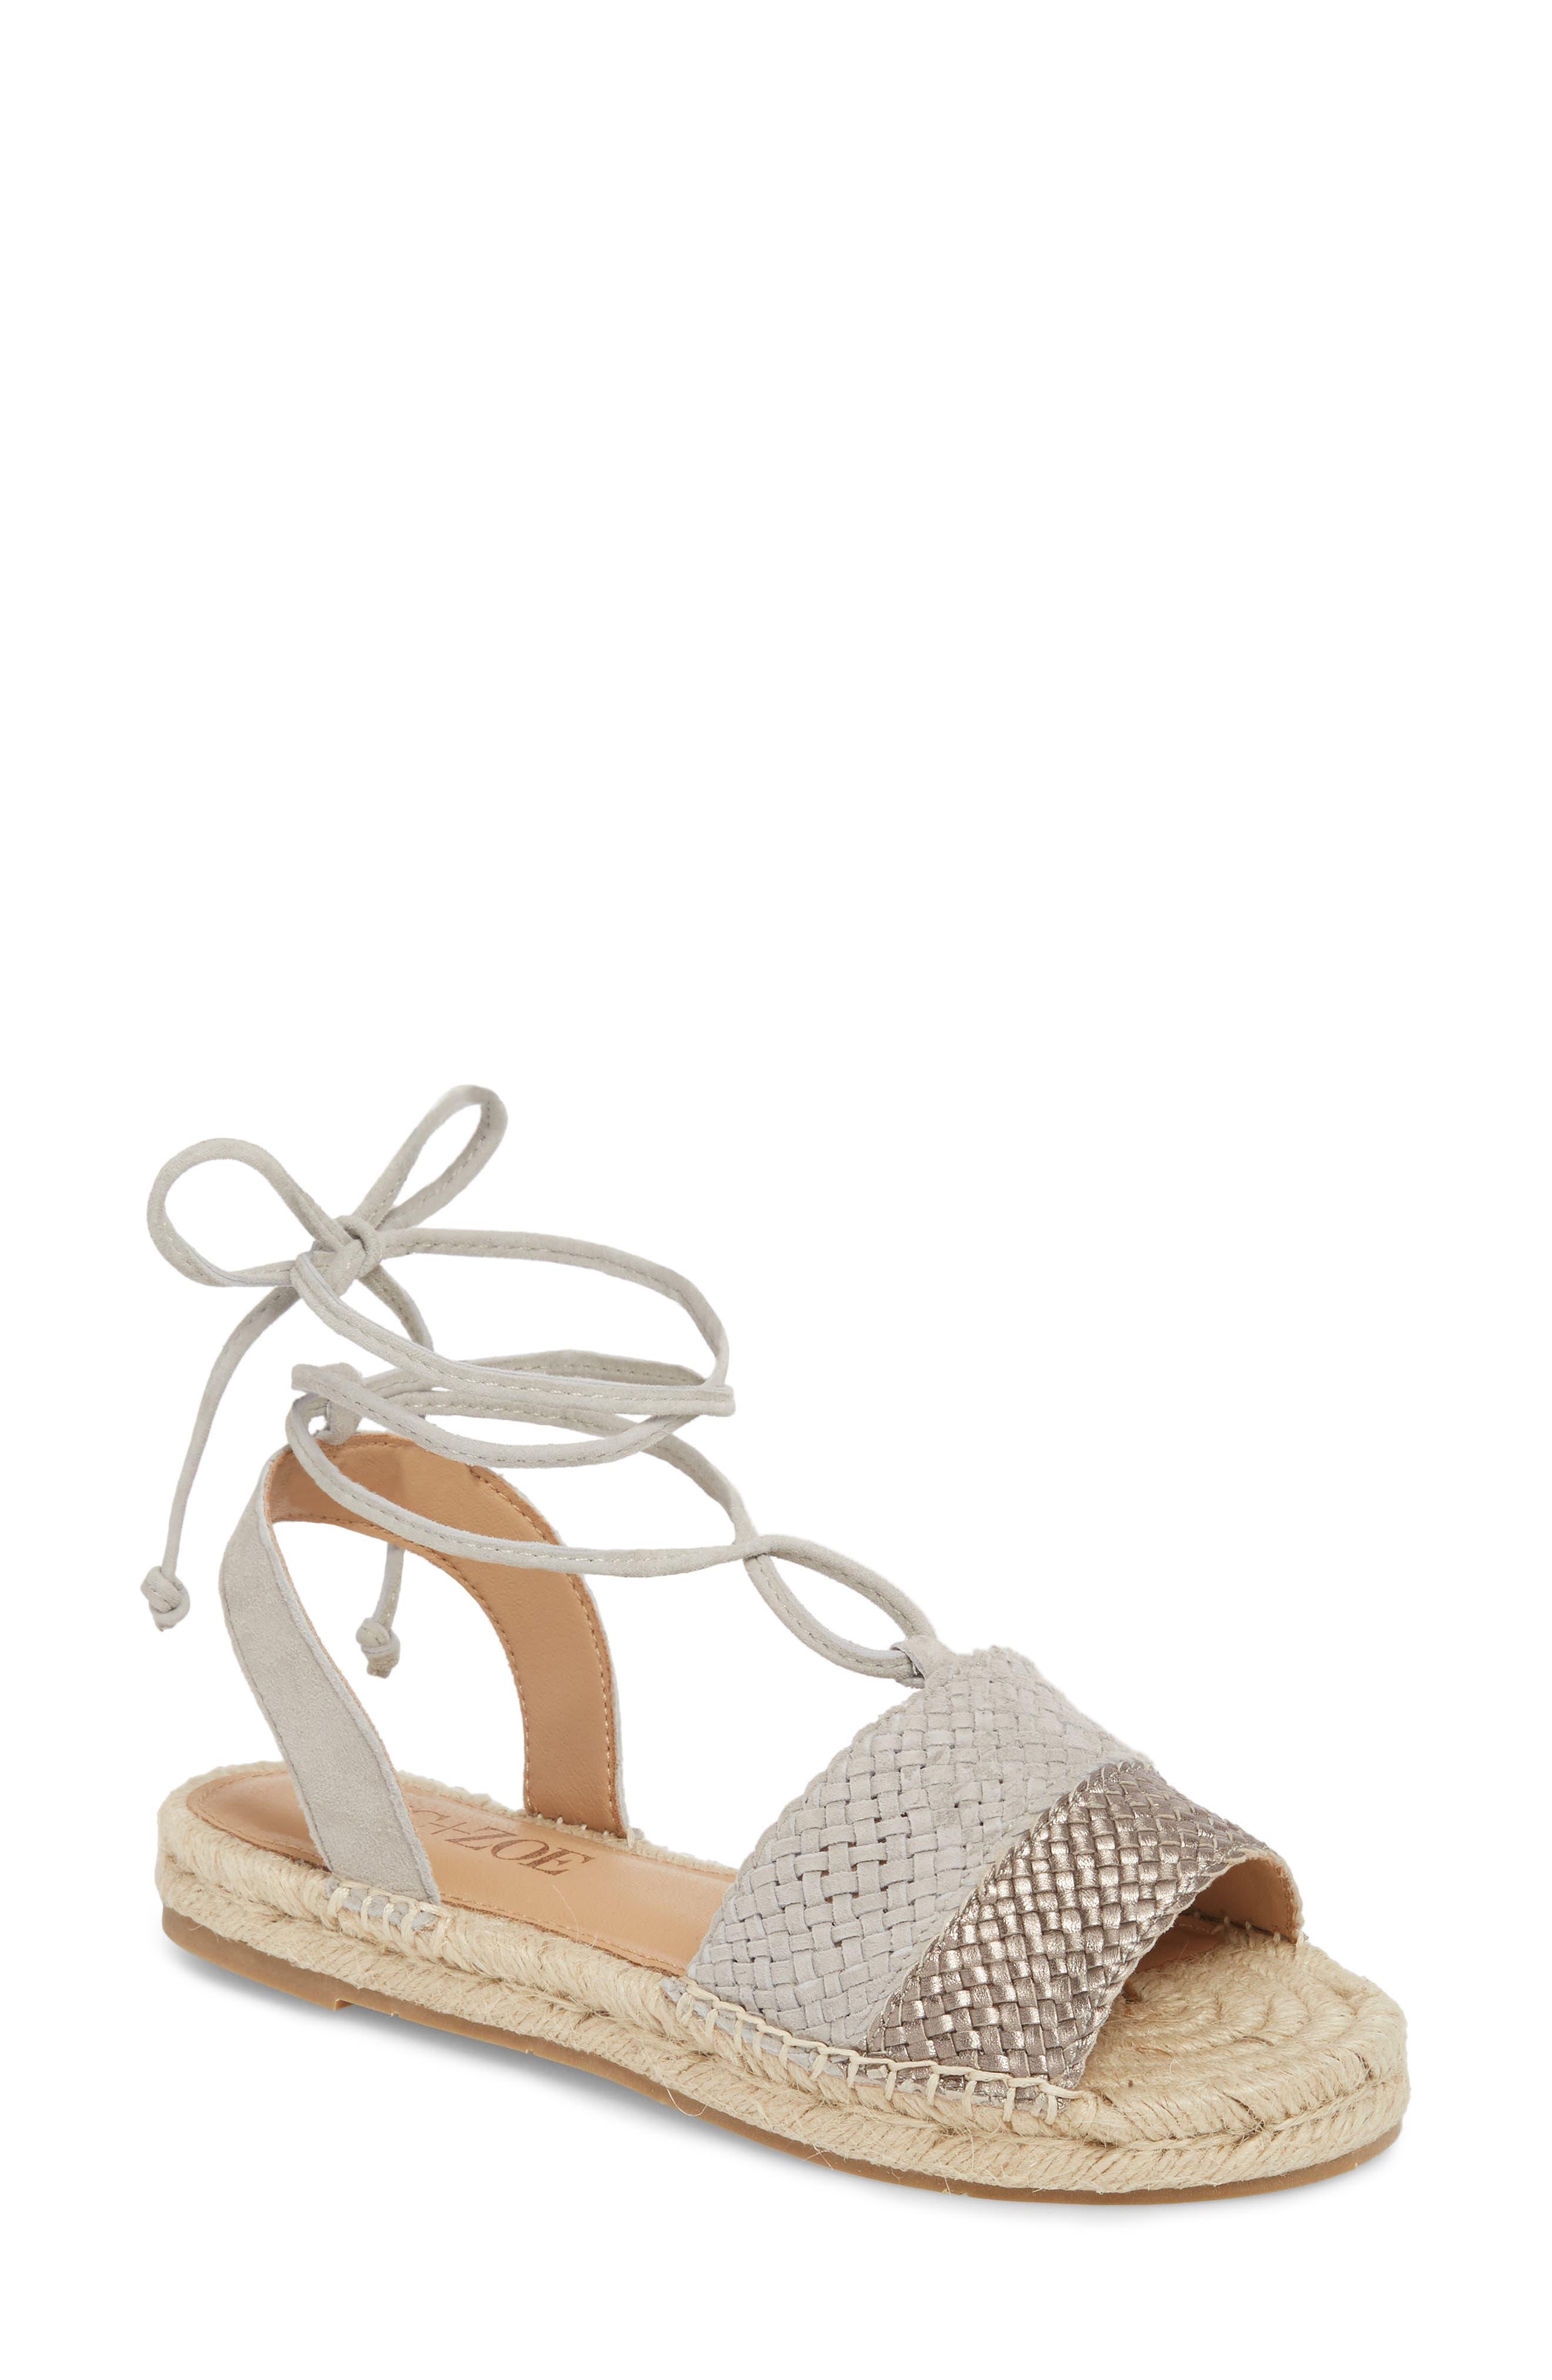 Eliza Ankle Wrap Espadrille Sandal,                         Main,                         color, Pewter/ French Linen